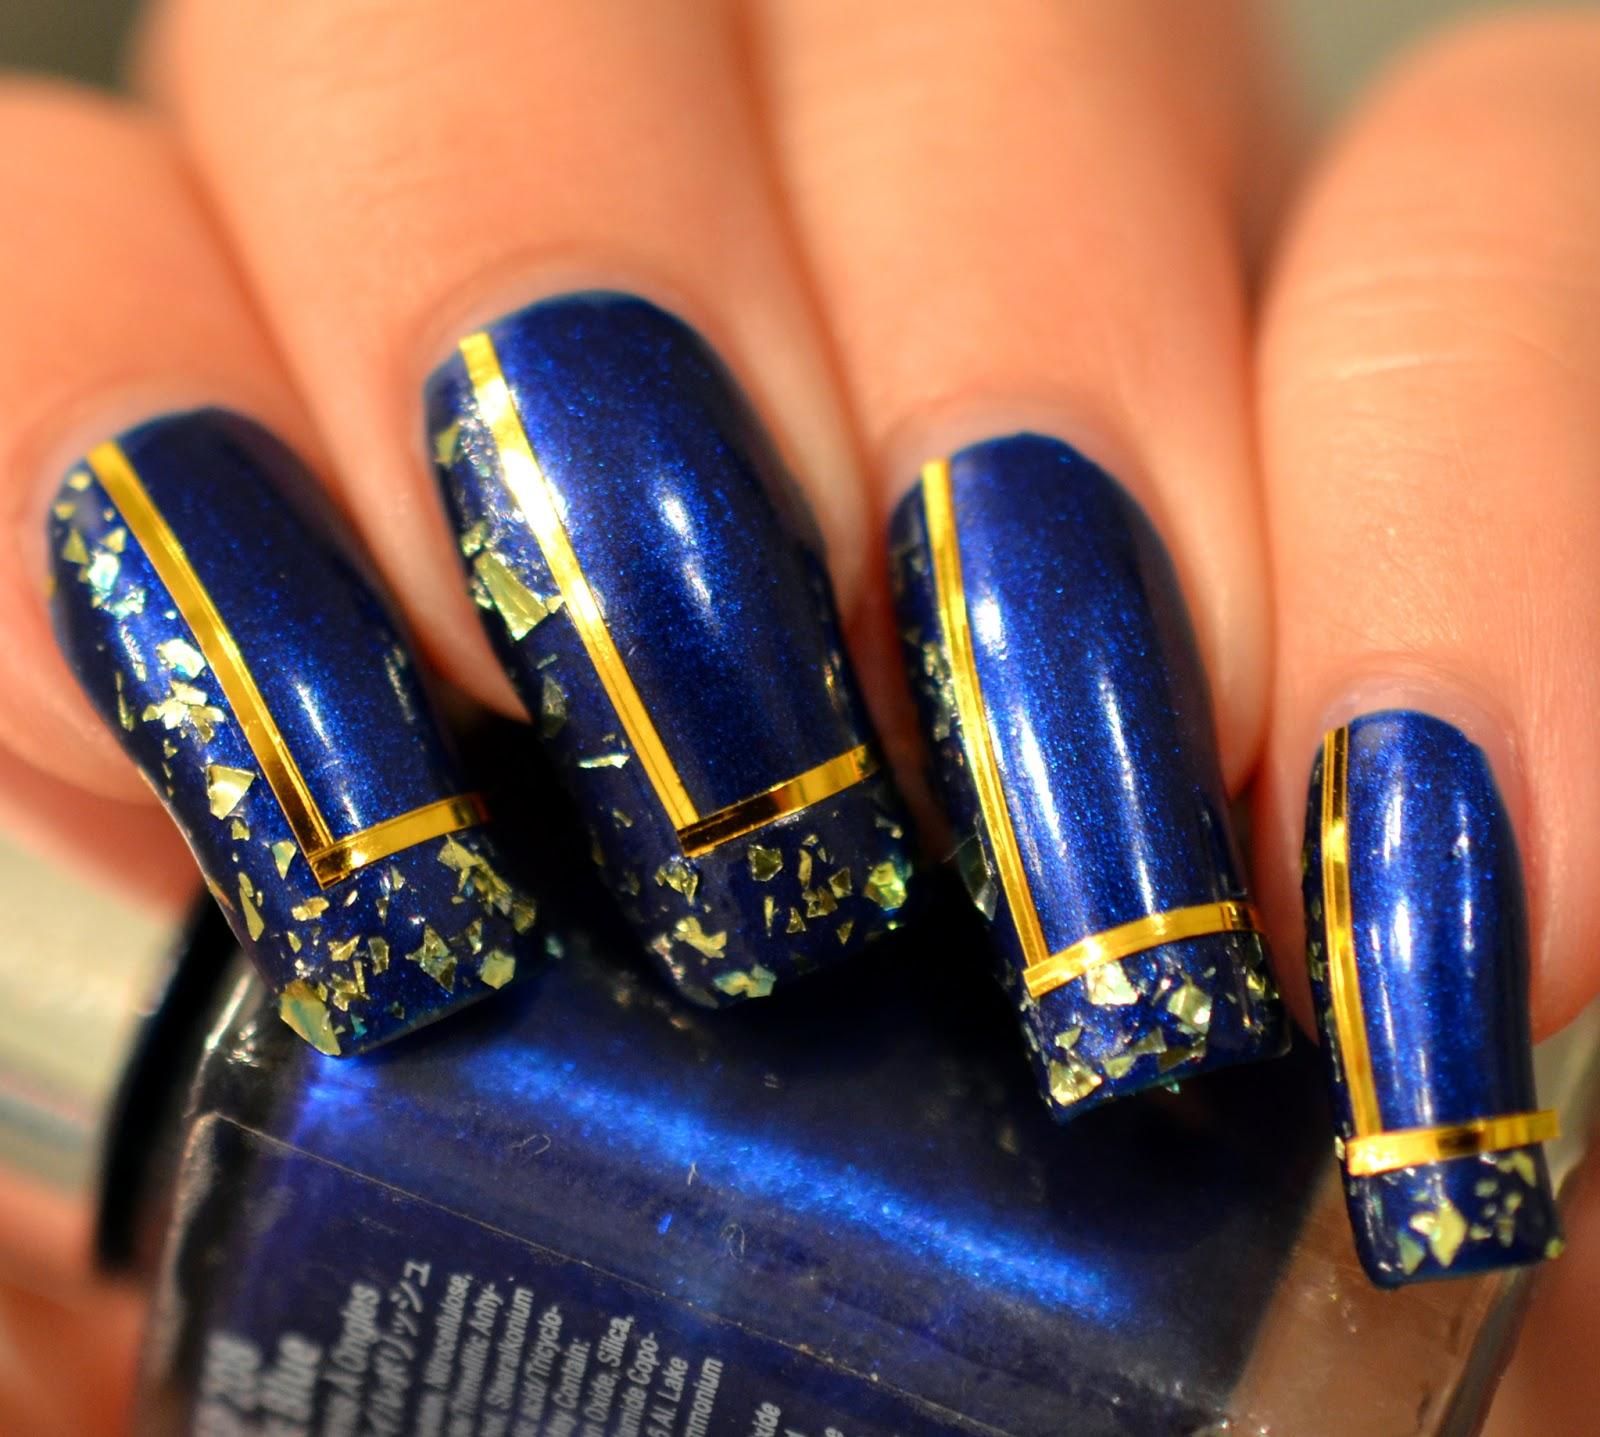 http://lenas-sofa.blogspot.de/2014/11/nyx-girls-nail-polish-208-pacific-blue.html